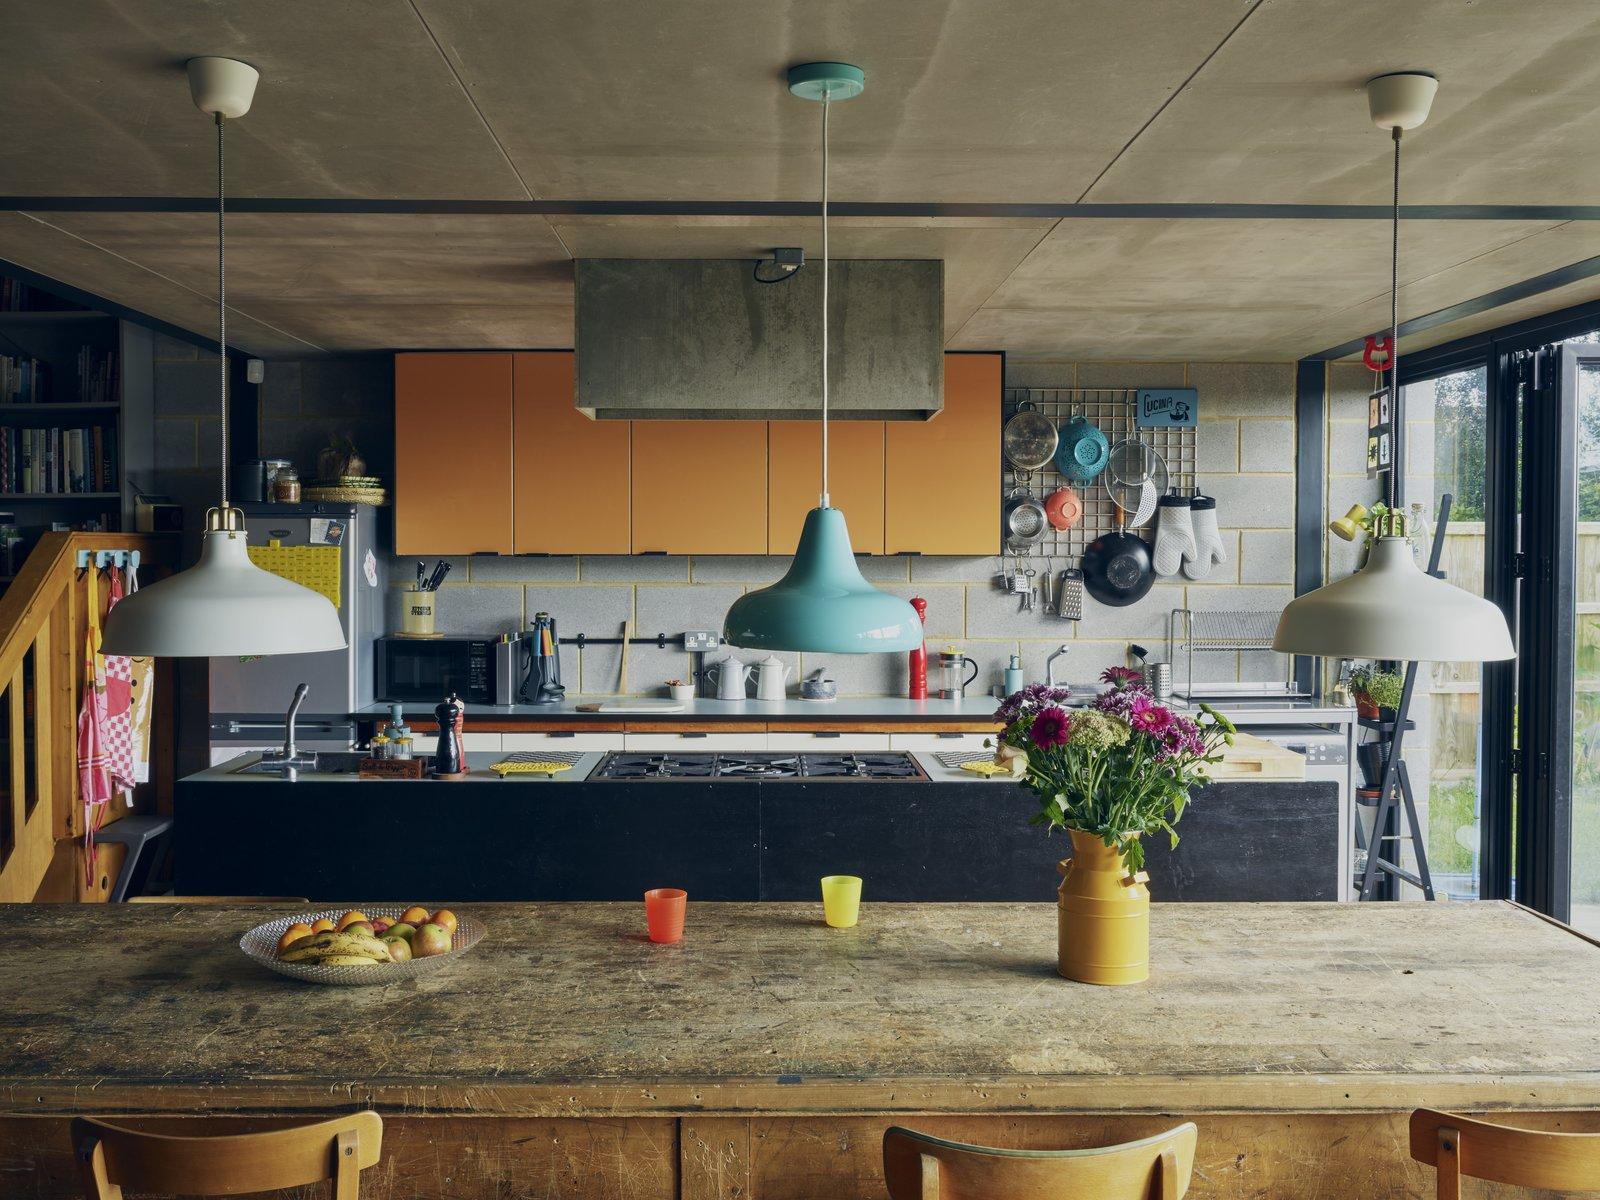 Kiefer Mbel Ikea Elegant Ikeambel Umgestalten With